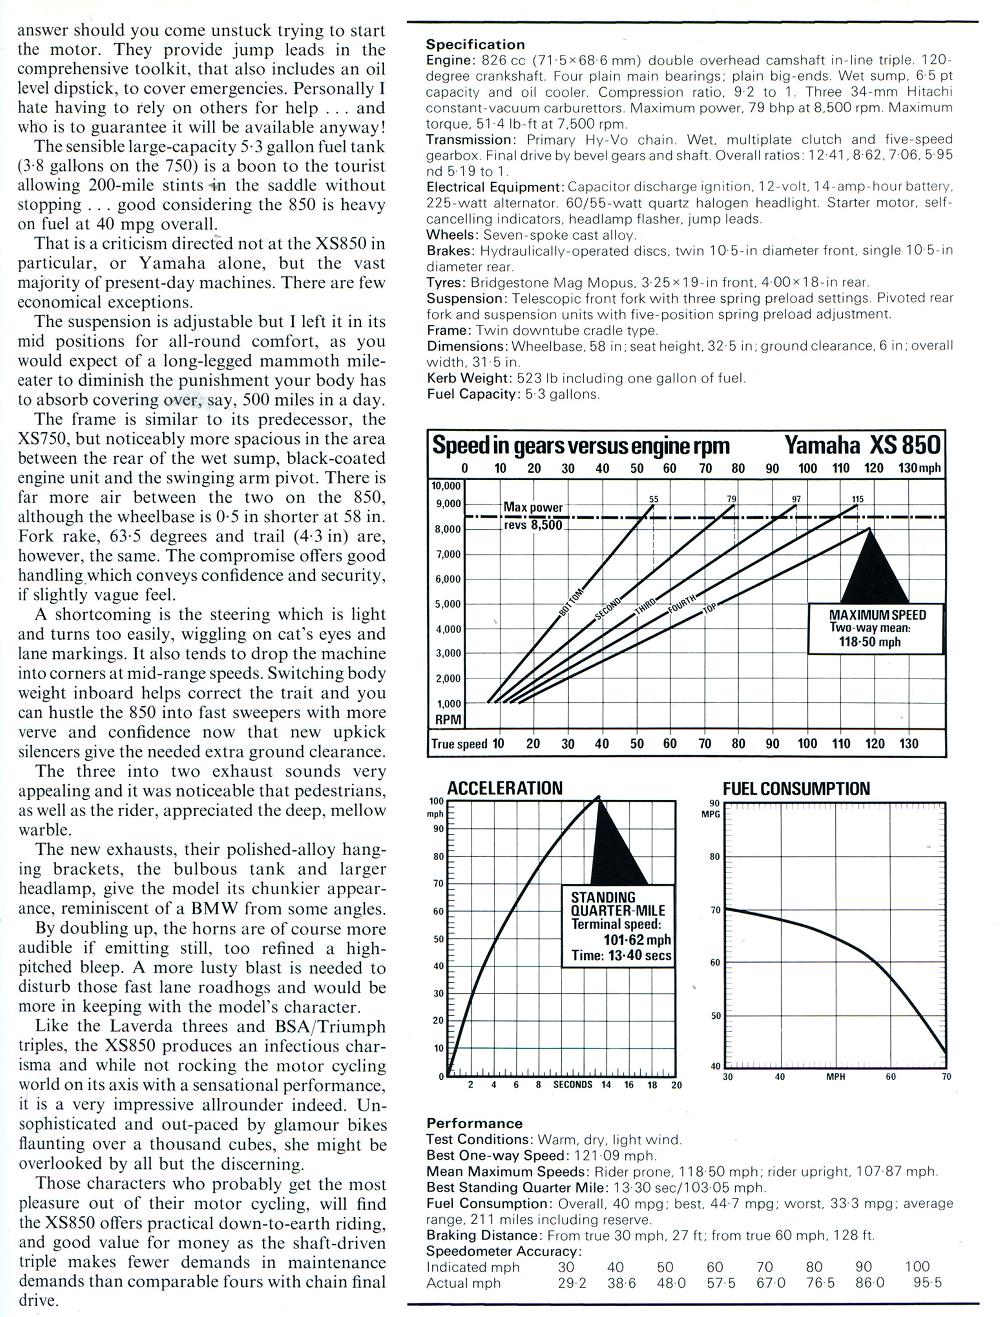 1982 Yamaha XS850 road test. 4.jpg